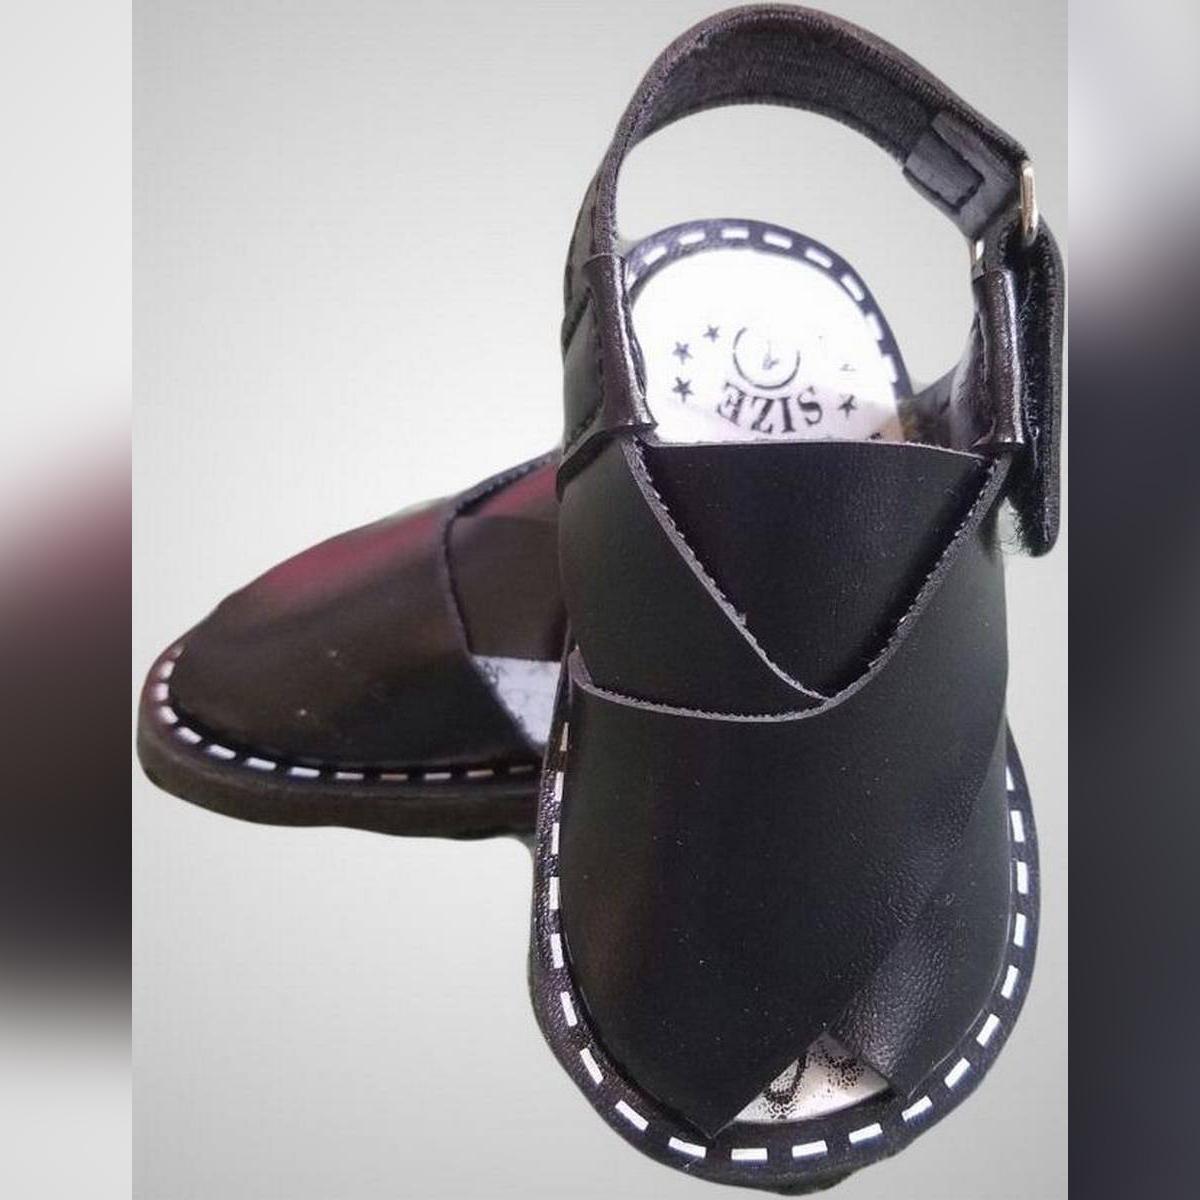 Peshawari Chappal For Unisex Babies sandal traditional style